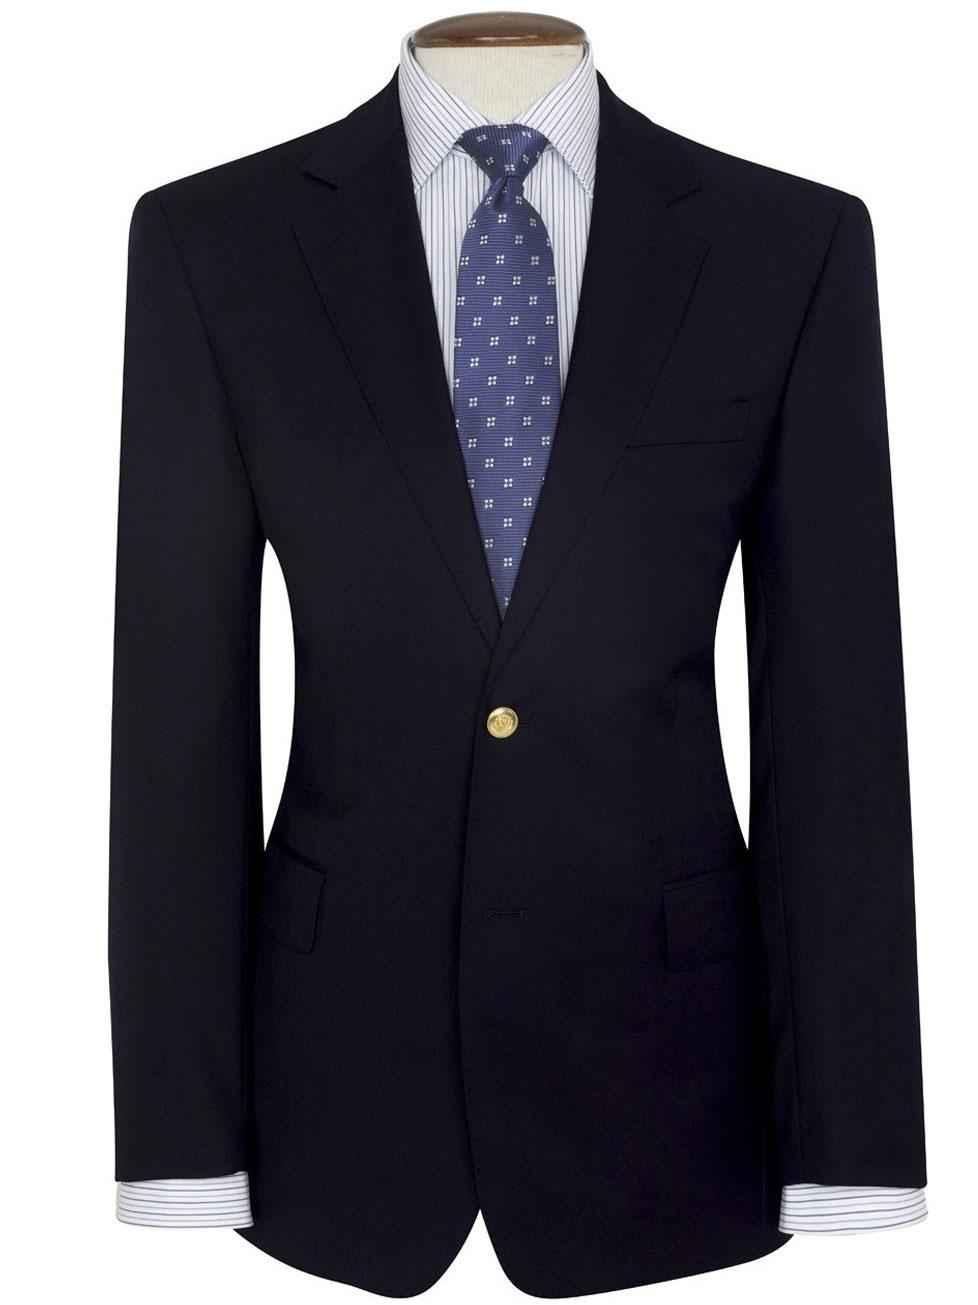 Blazers For Men Pinterest: Navy Single Breasted Blazer